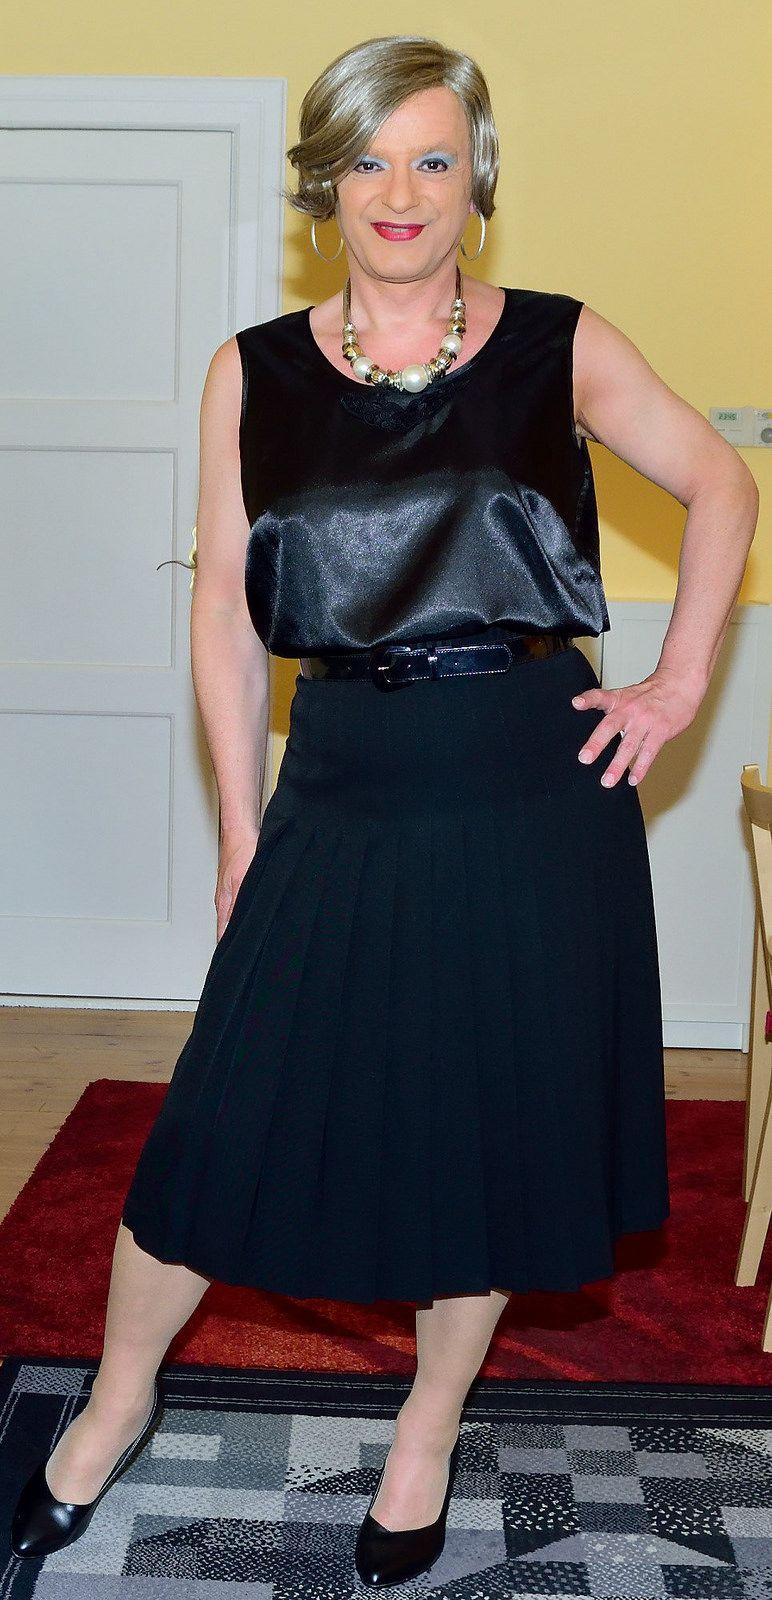 Birgit025441 in 2020 Fashion, Leather skirt, Demure